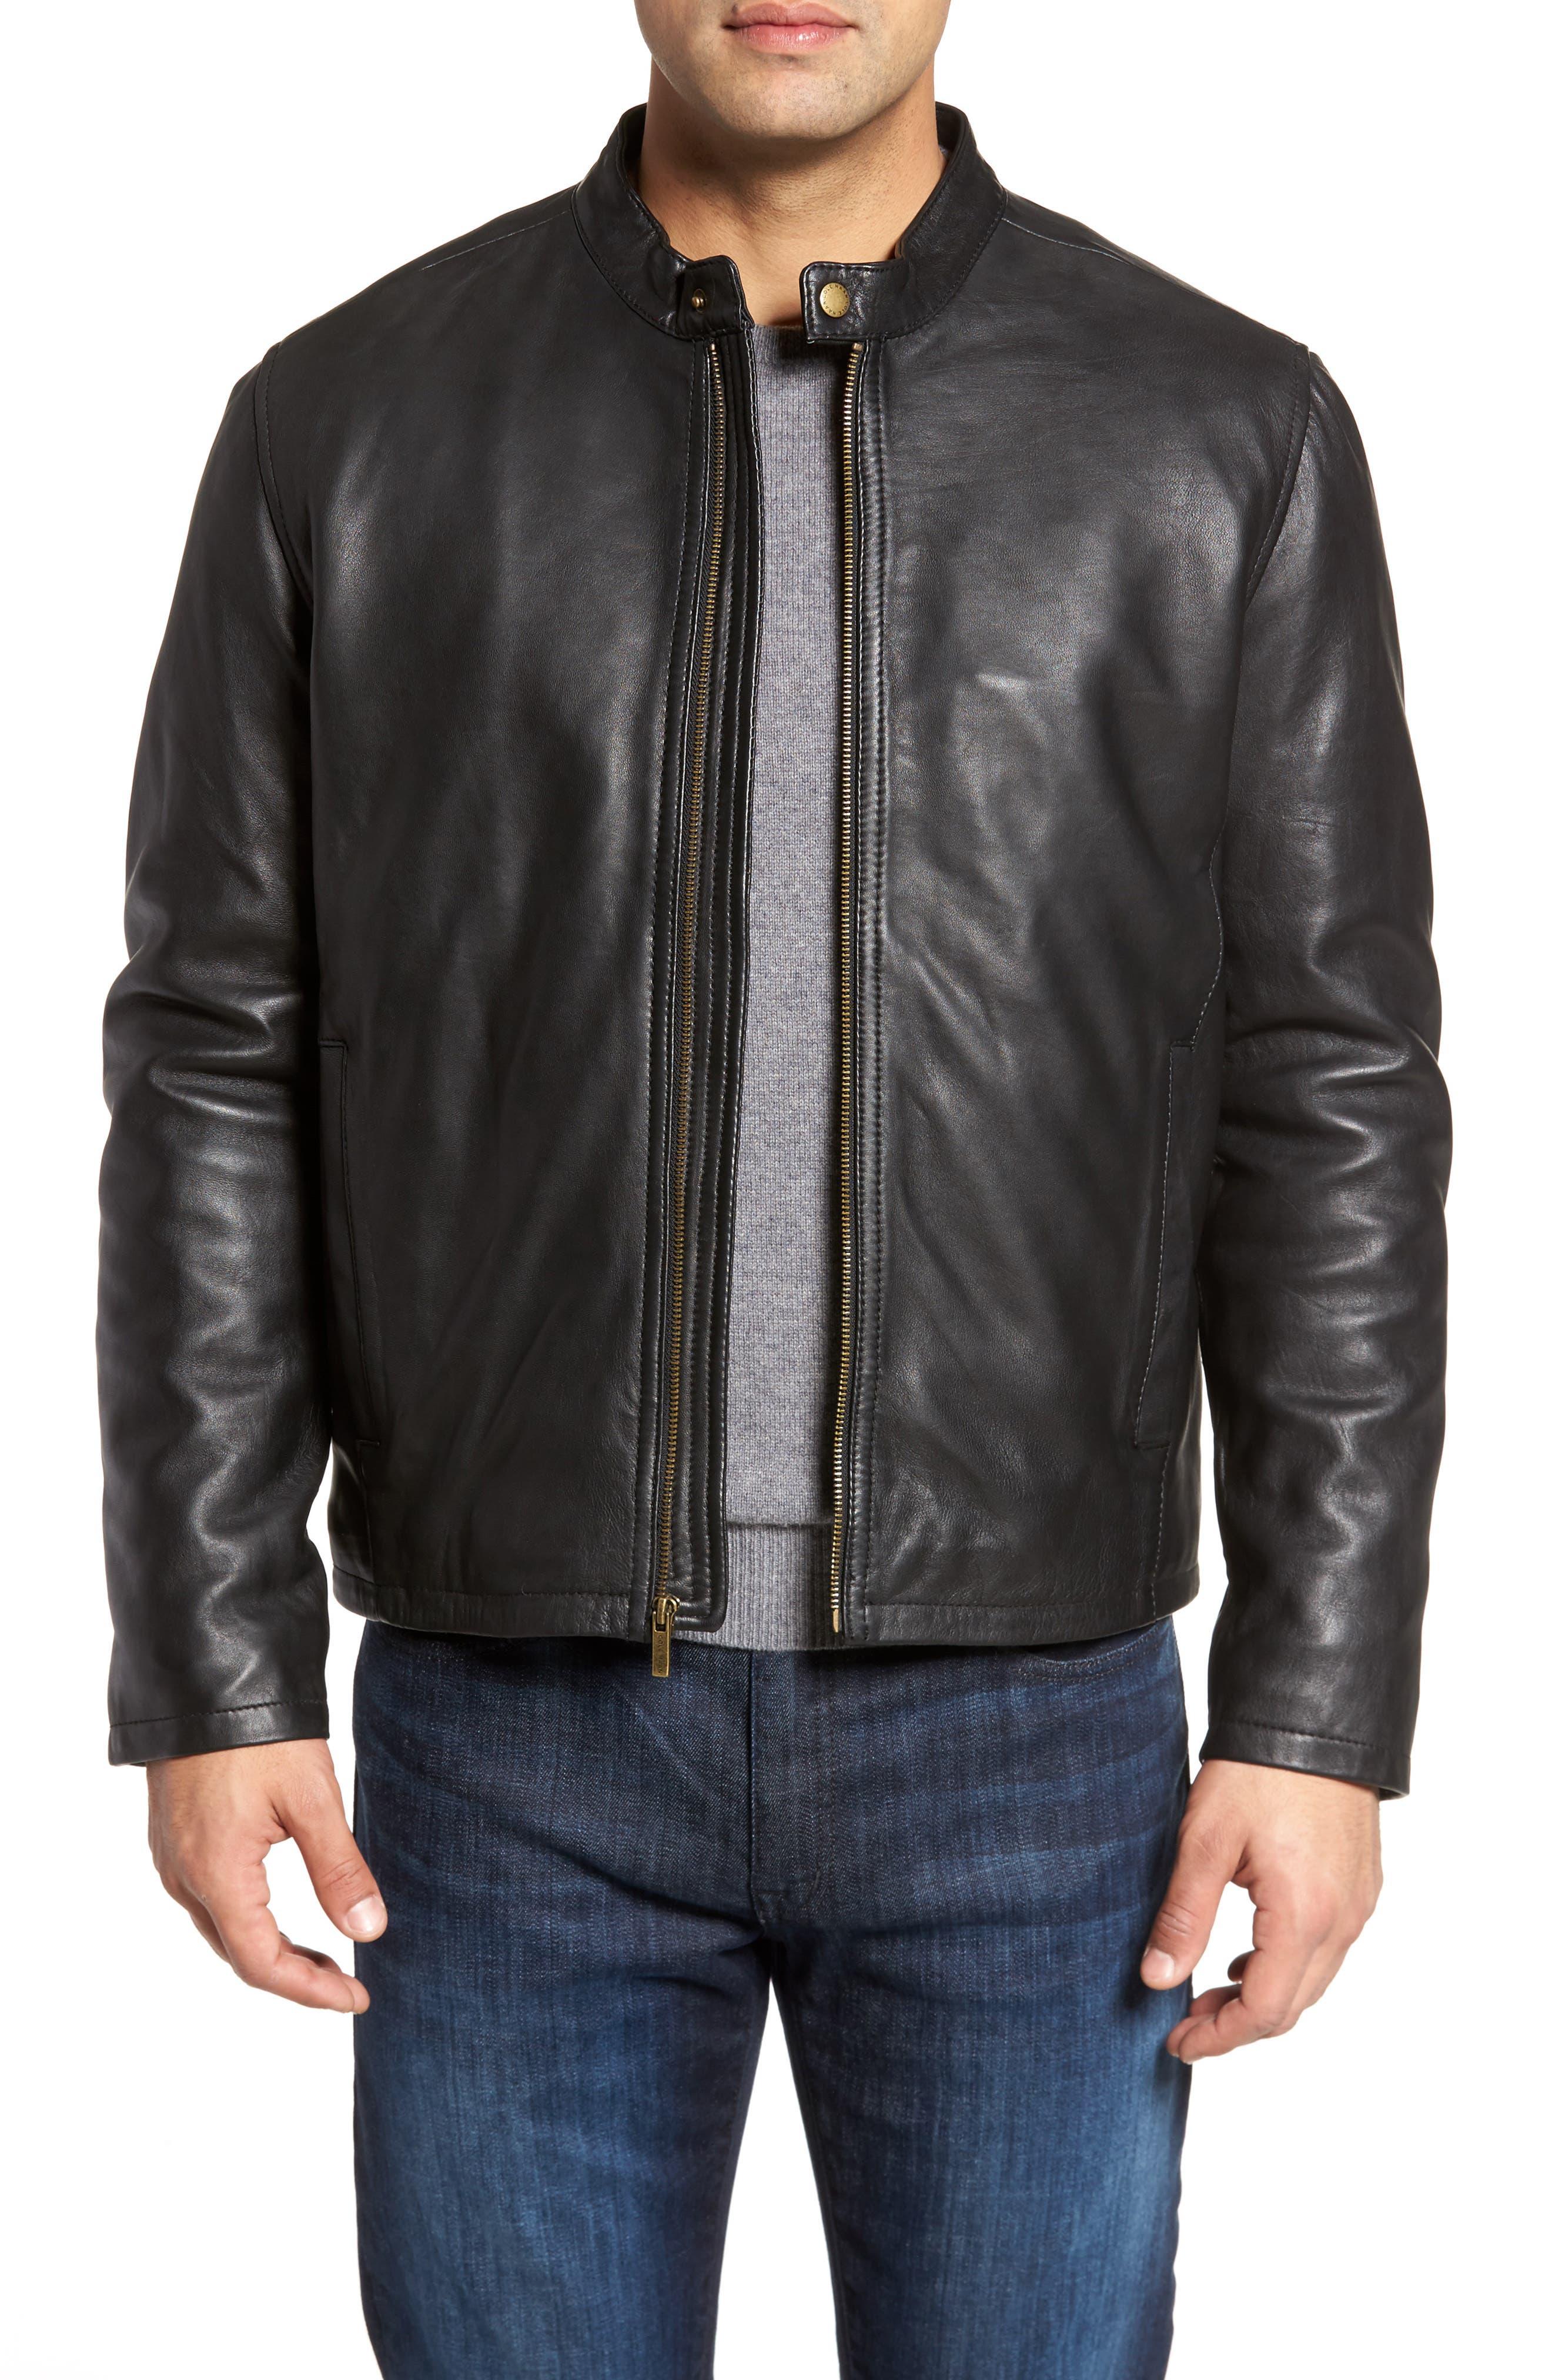 COLE HAAN, Lambskin Leather Moto Jacket, Main thumbnail 1, color, 001